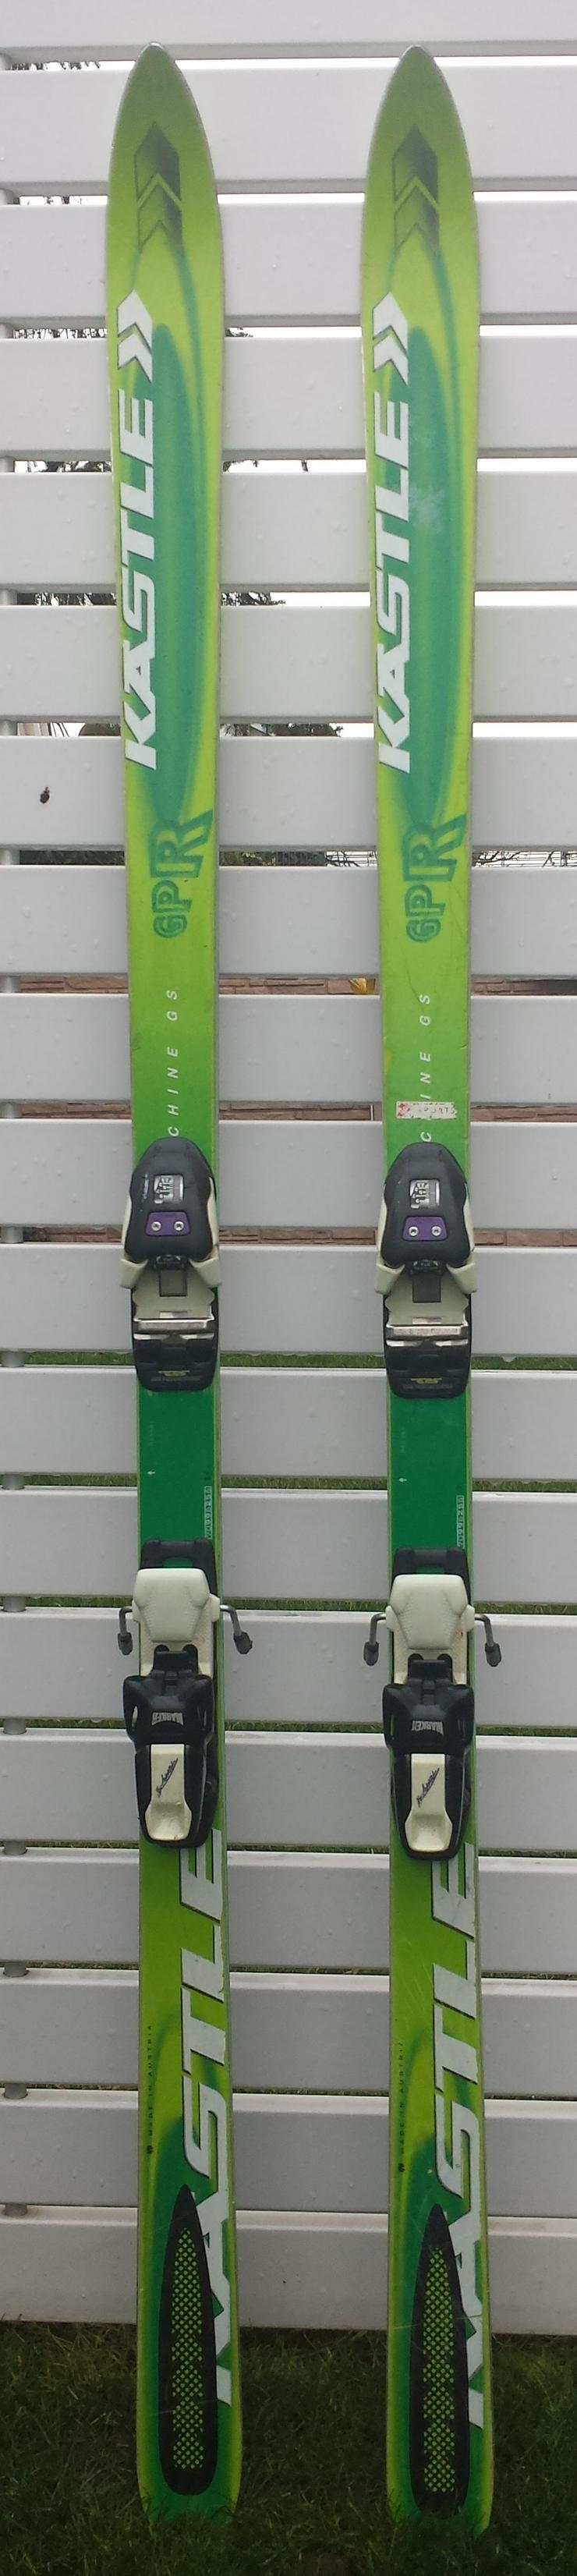 Ski, Skistöcke, Wintersport